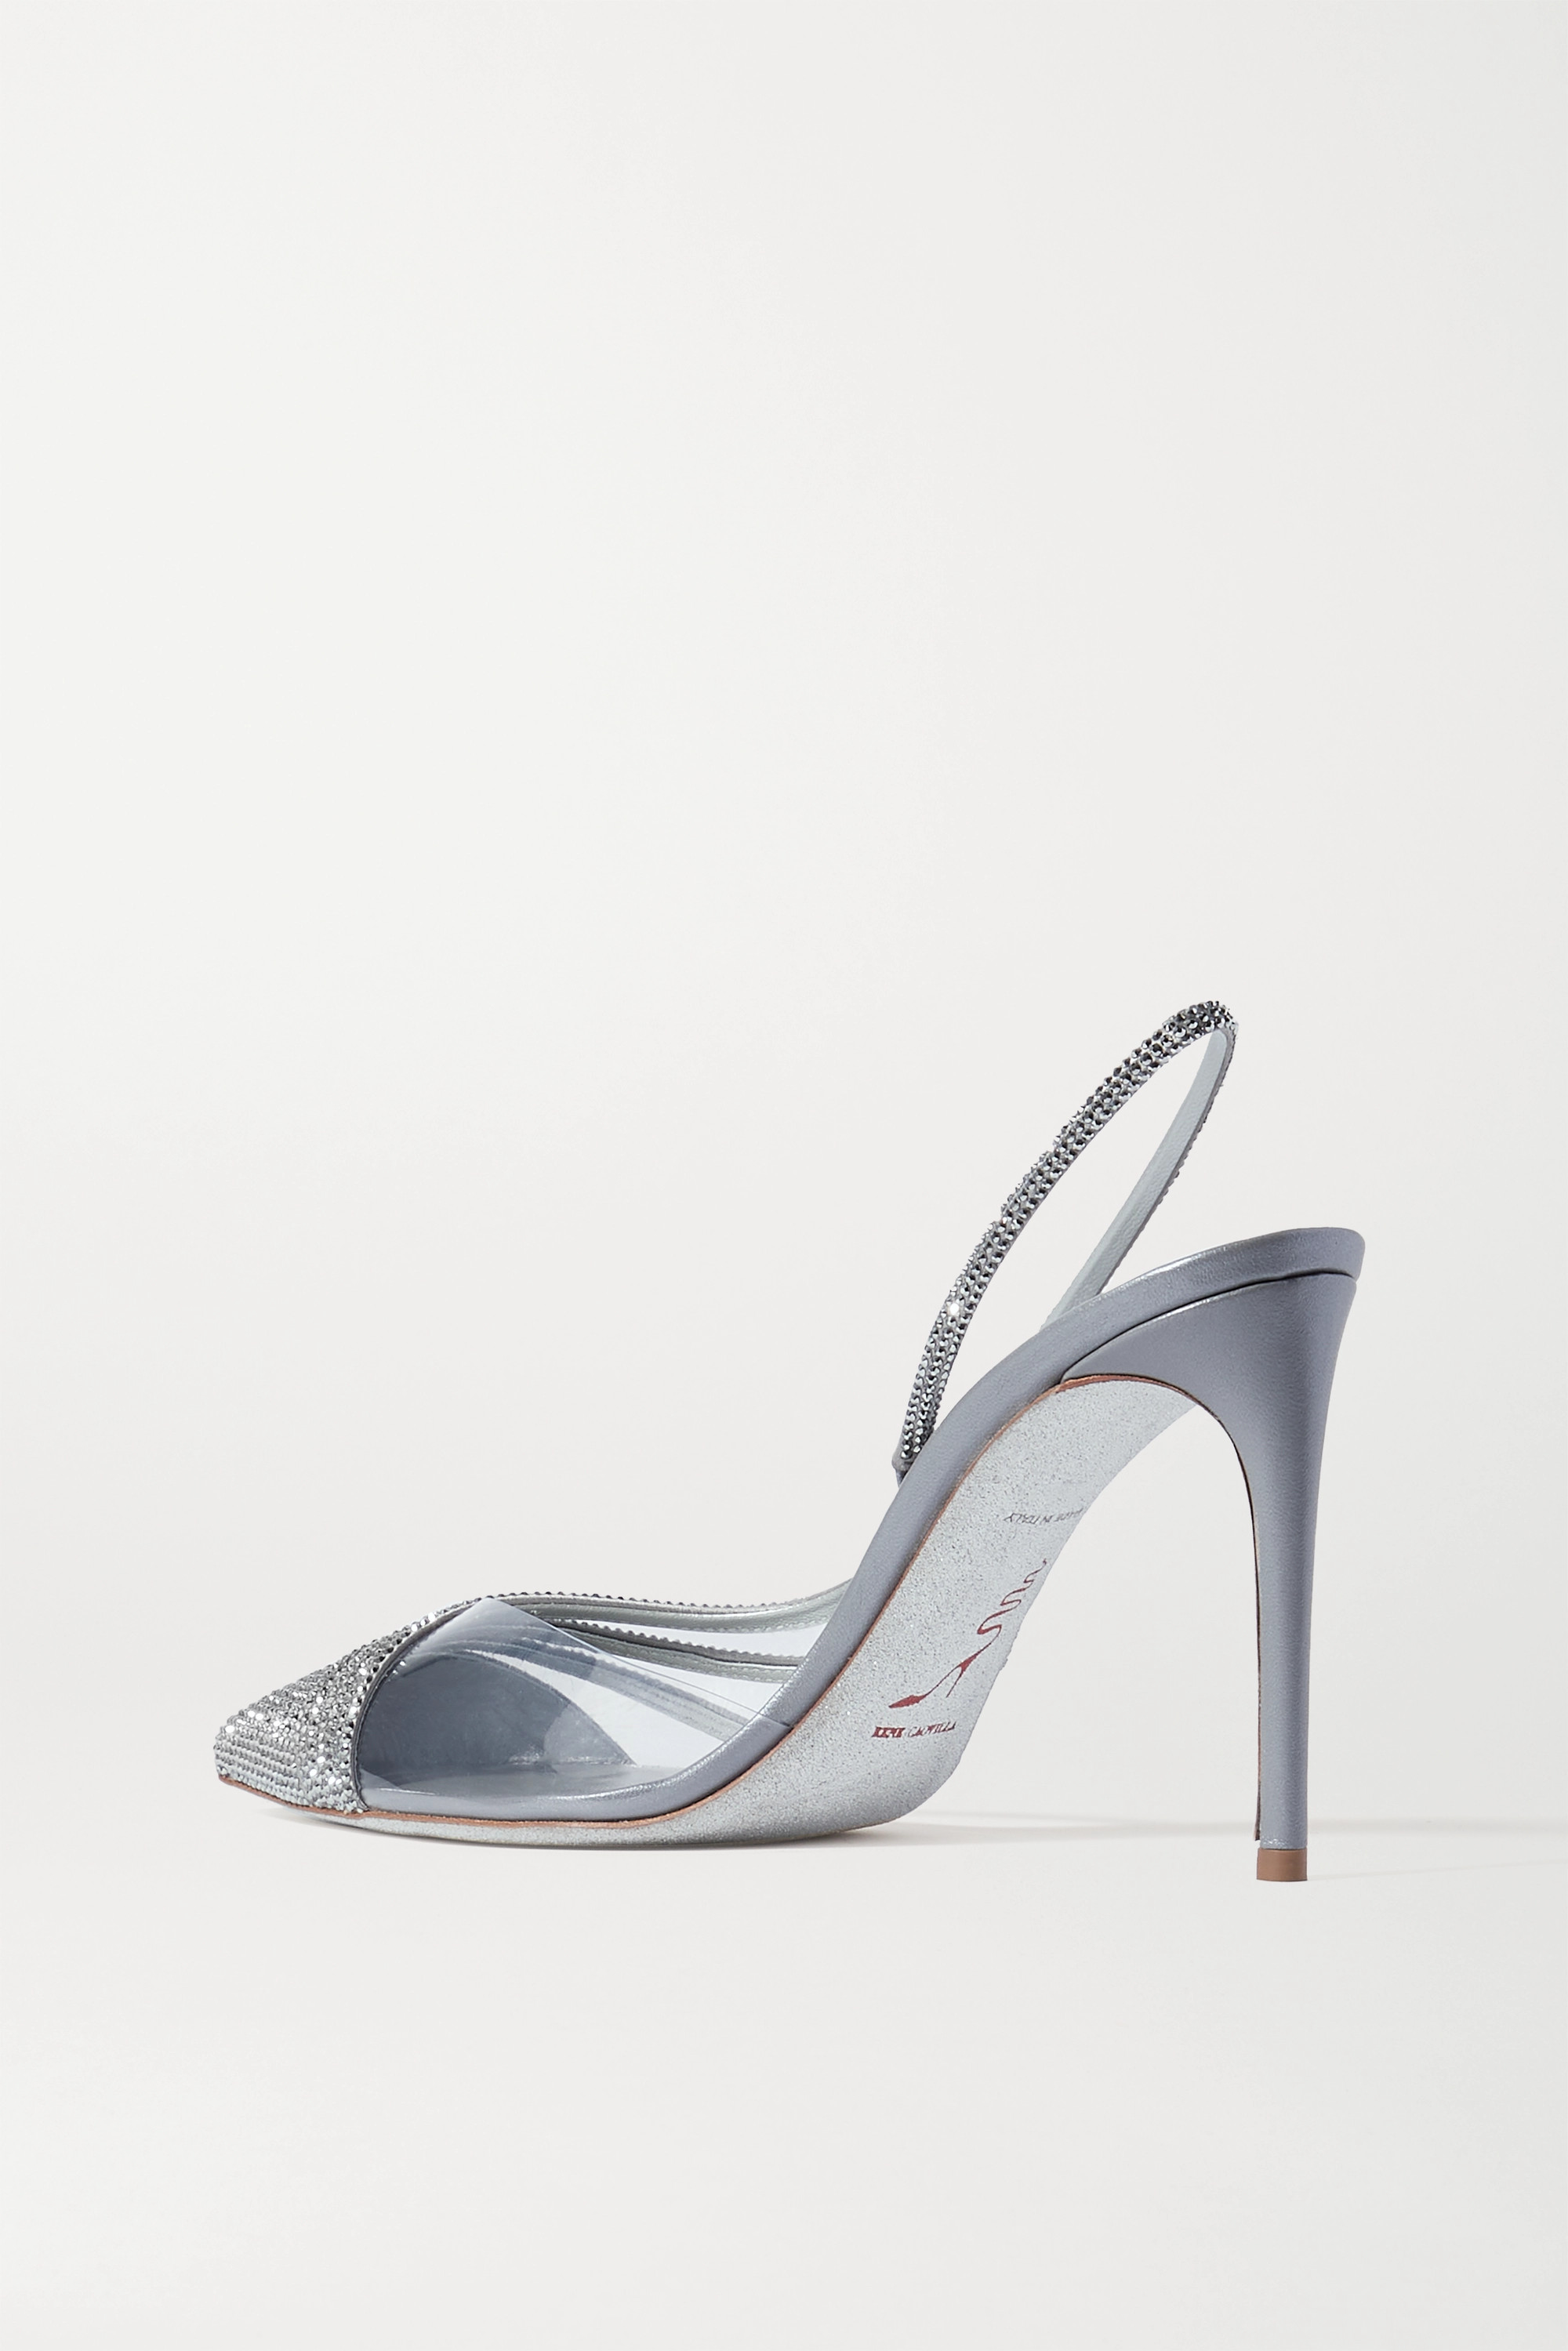 René Caovilla Crystal-embellished satin and PVC slingback pumps